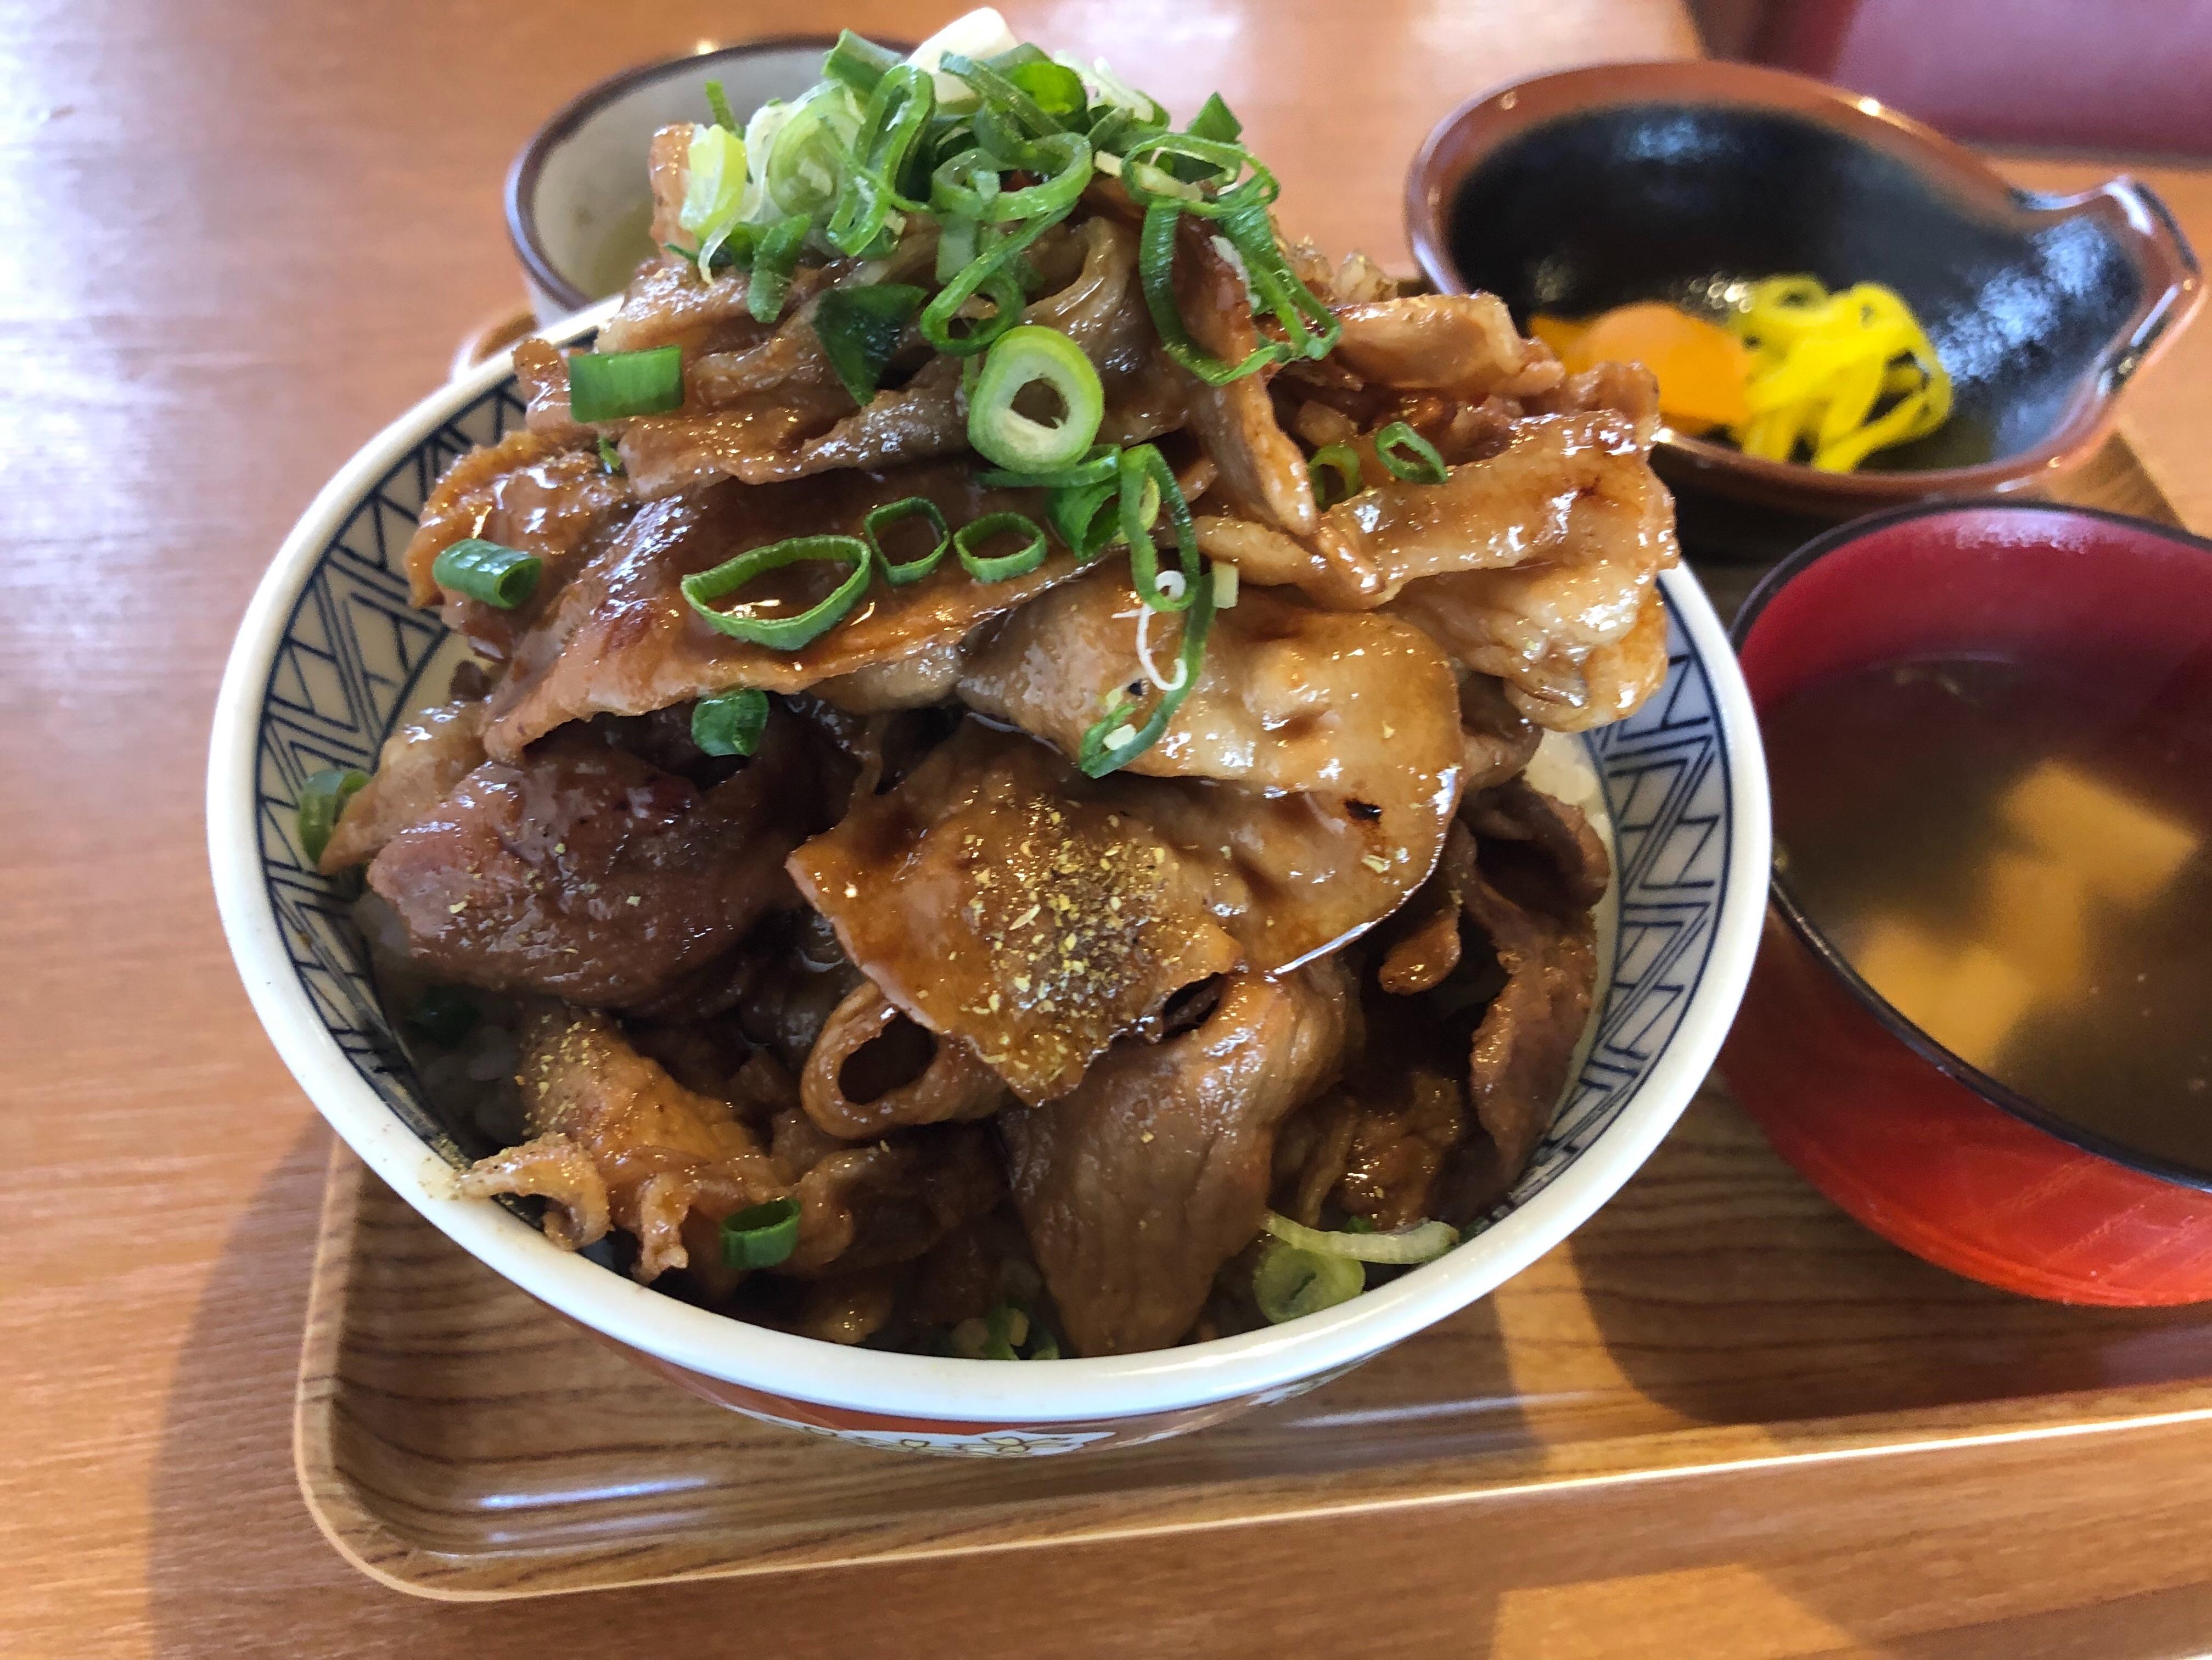 f:id:masanori-kato1972:20190417194626j:image